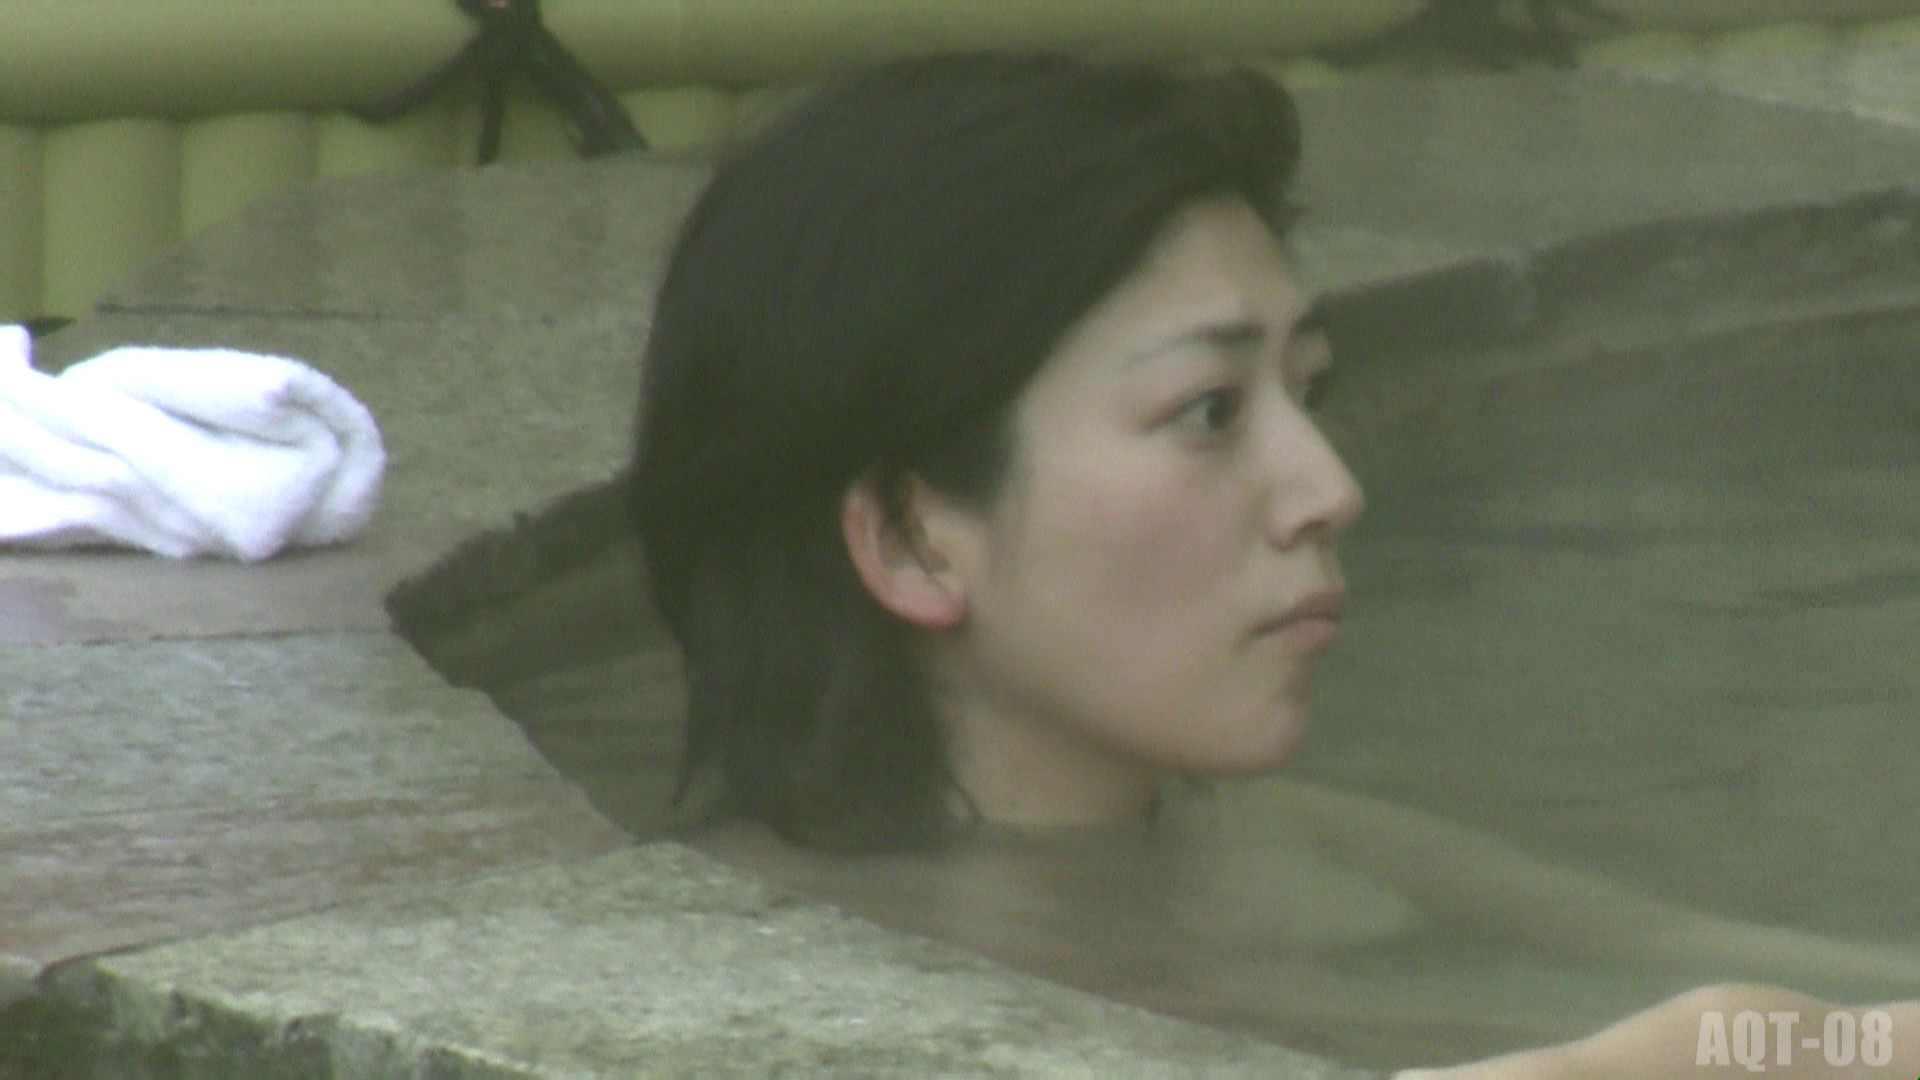 Aquaな露天風呂Vol.776 盗撮 エロ無料画像 108画像 29